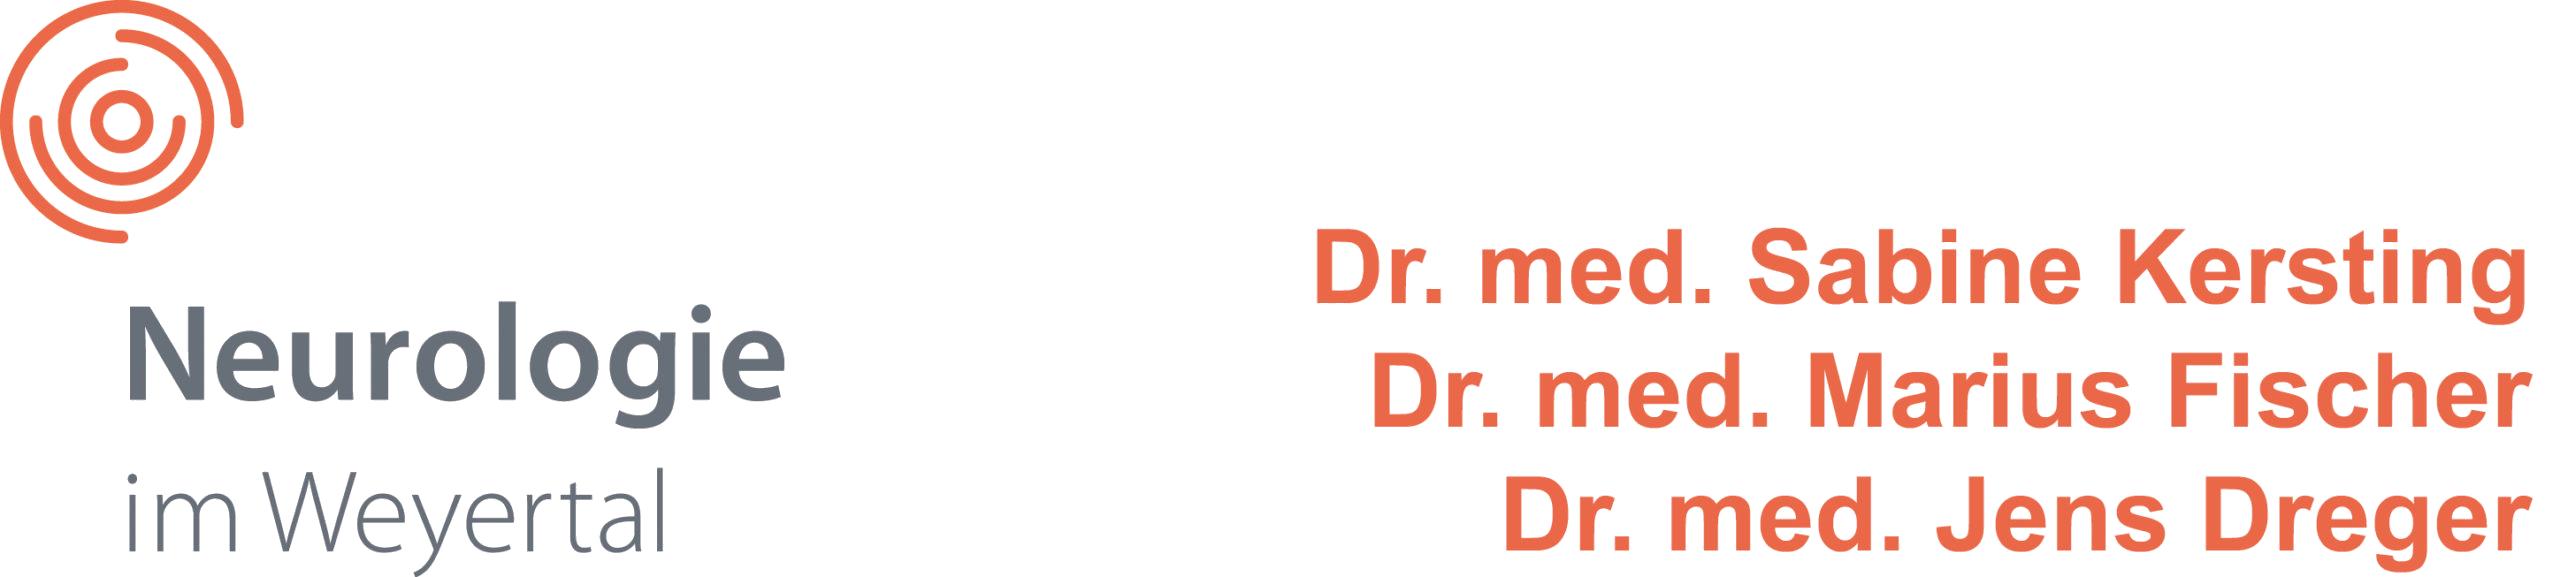 Neurologie im Weyertal